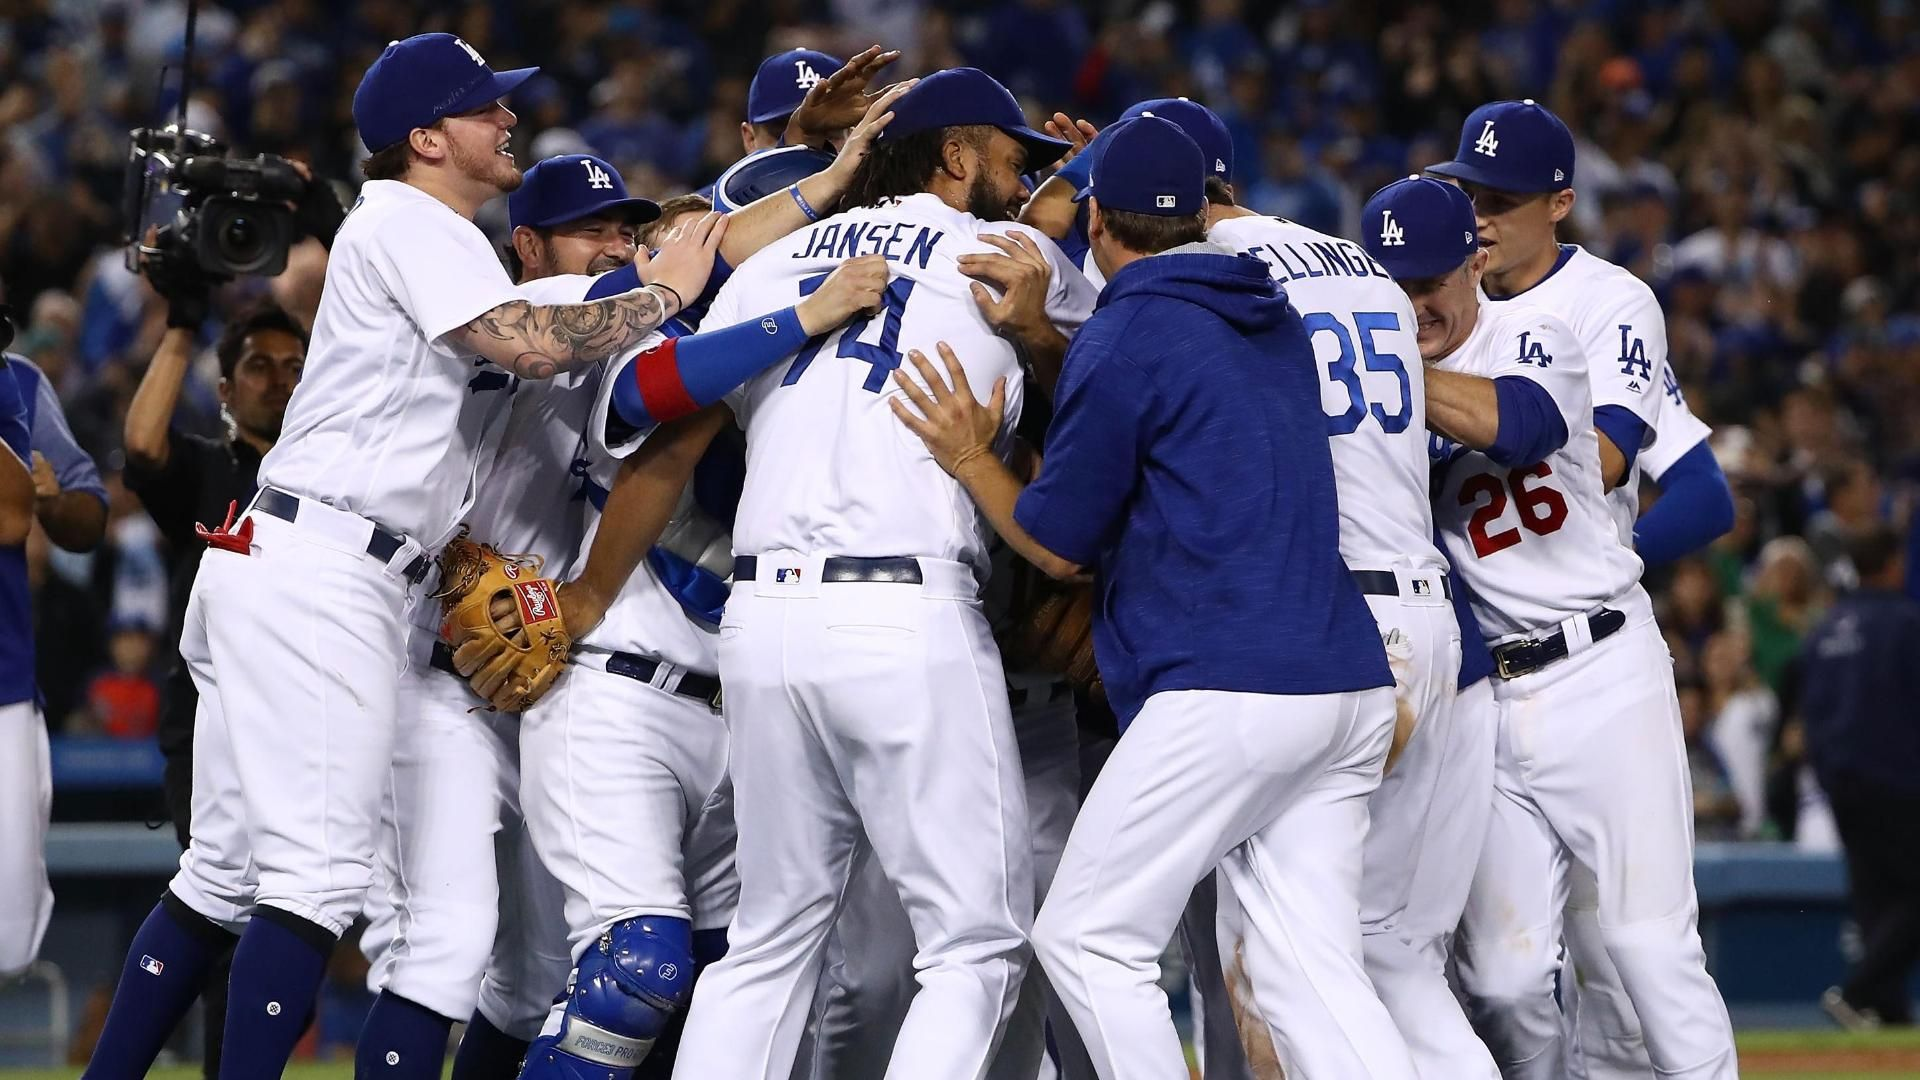 Dodgers clinch division title